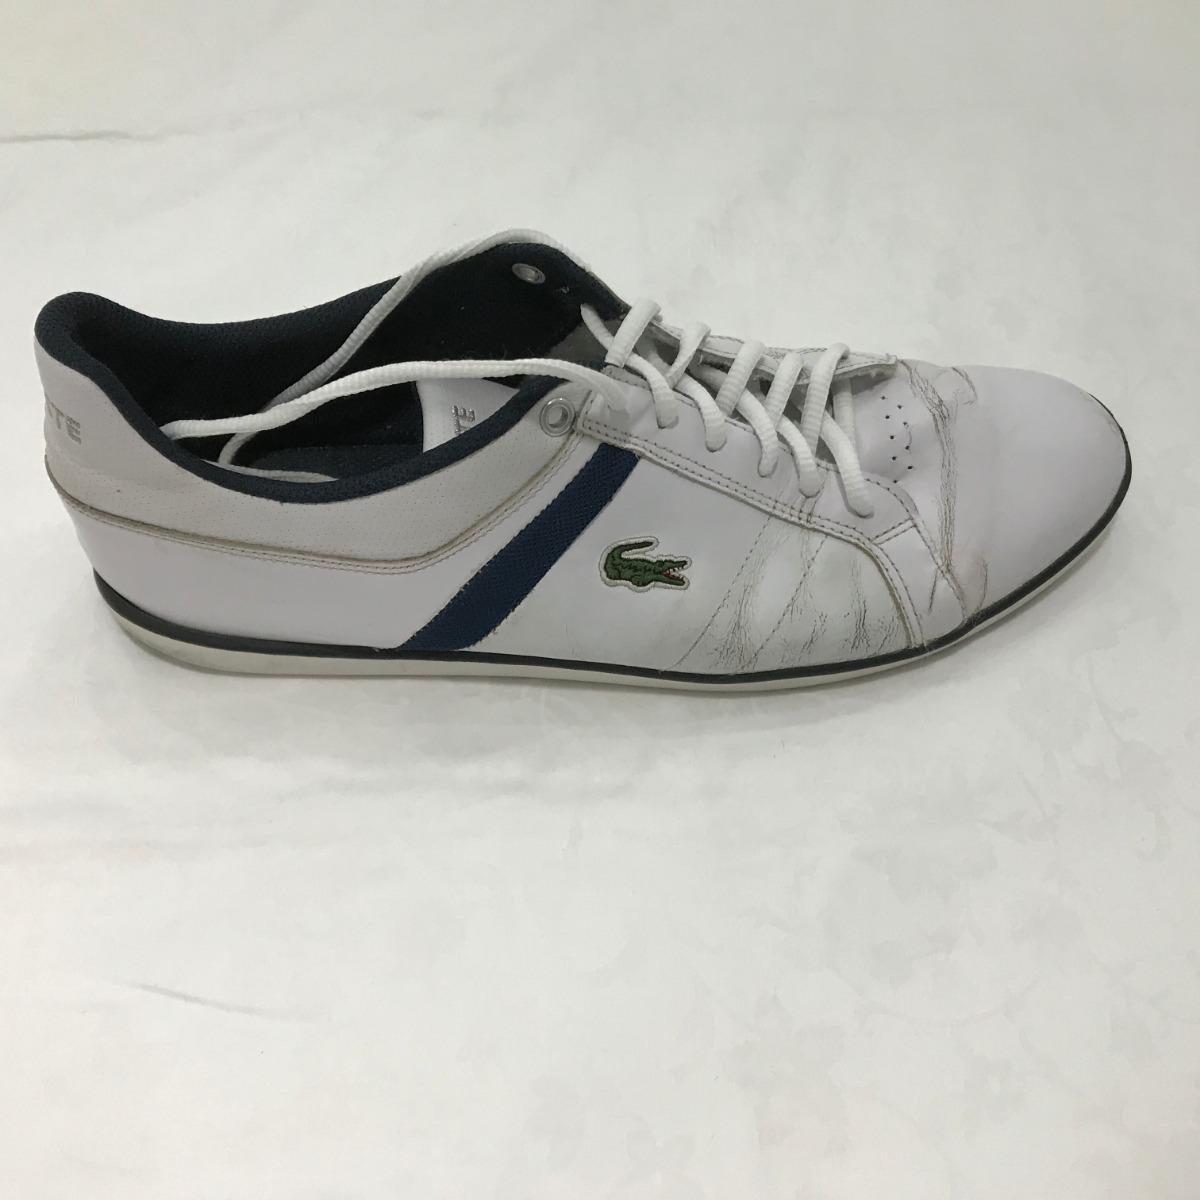 42718c19df8 tênis lacoste evershot couro branco azul escuro tamanho 44. Carregando zoom.